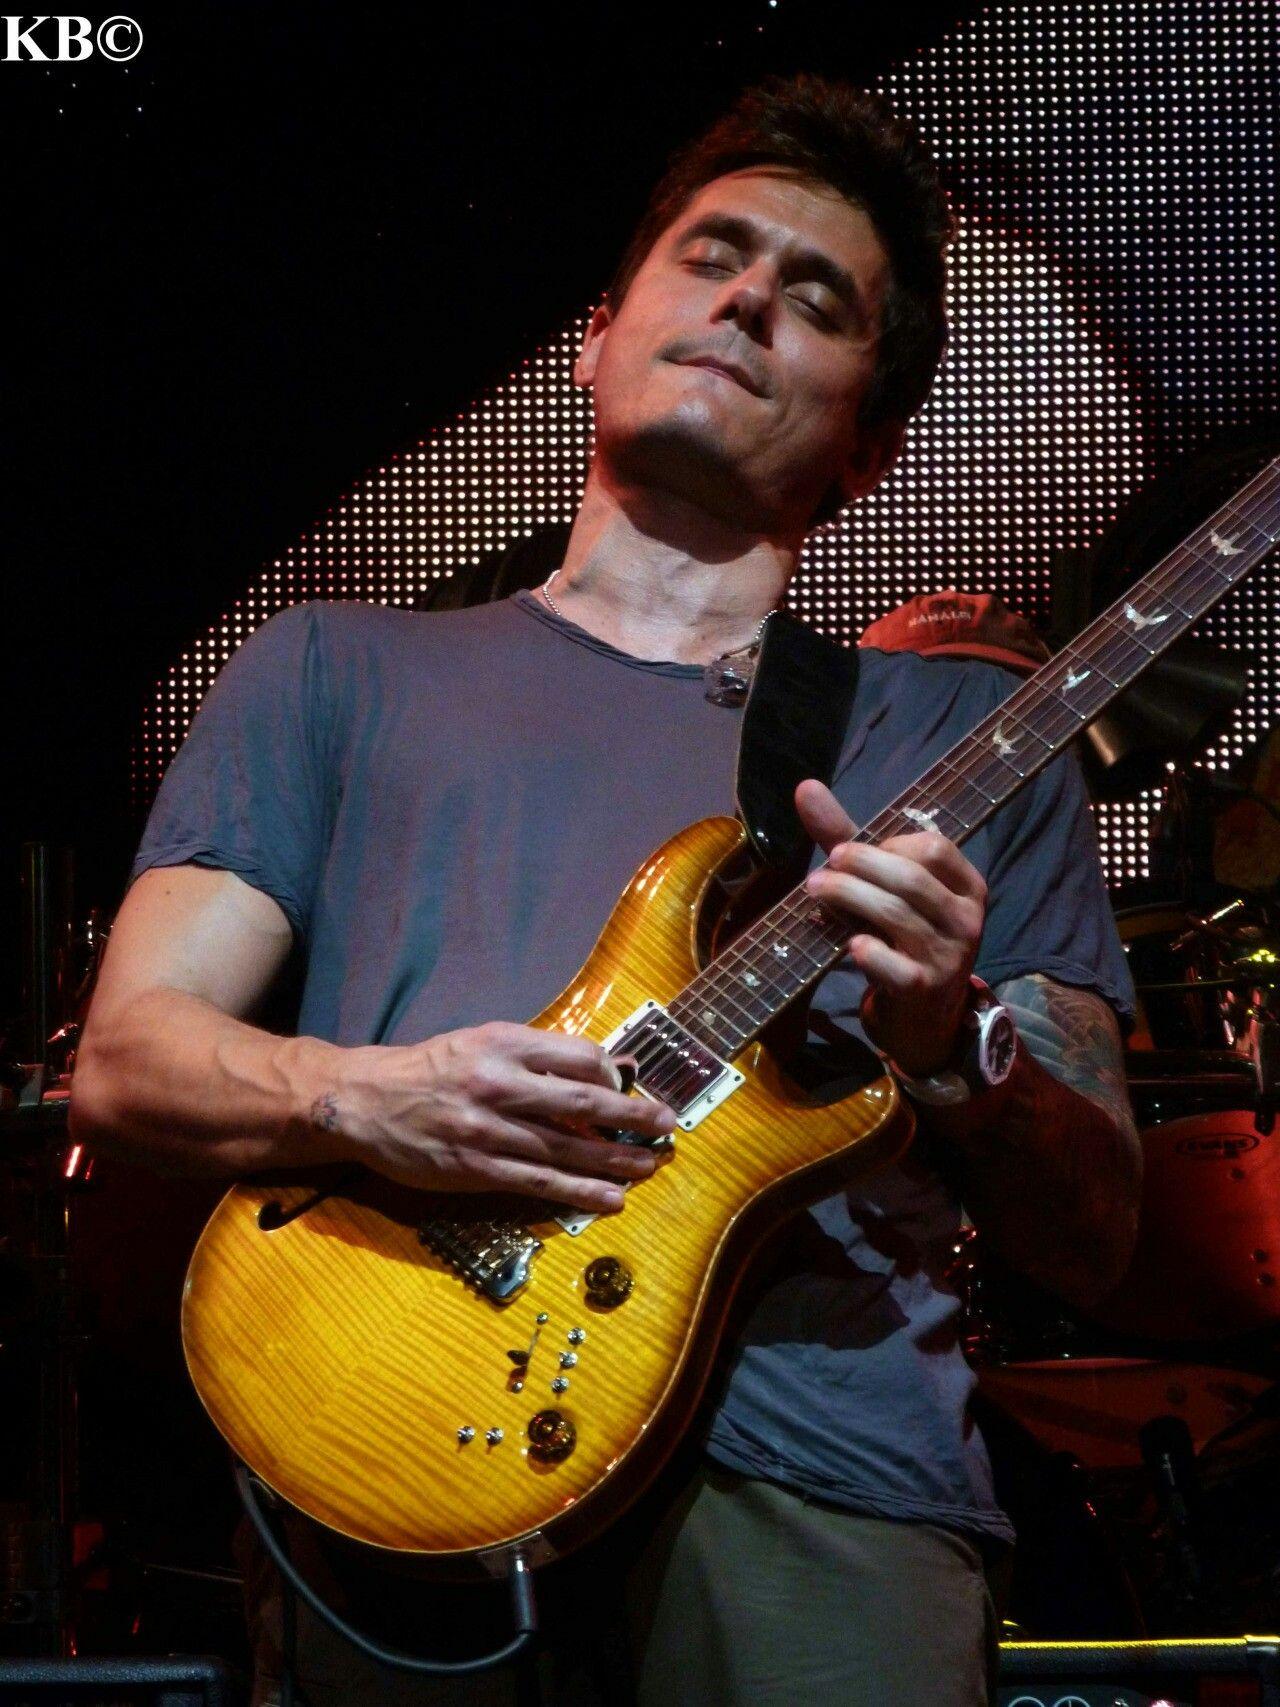 Cincinnati June 16   John mayer, Dead and company, Summer tour